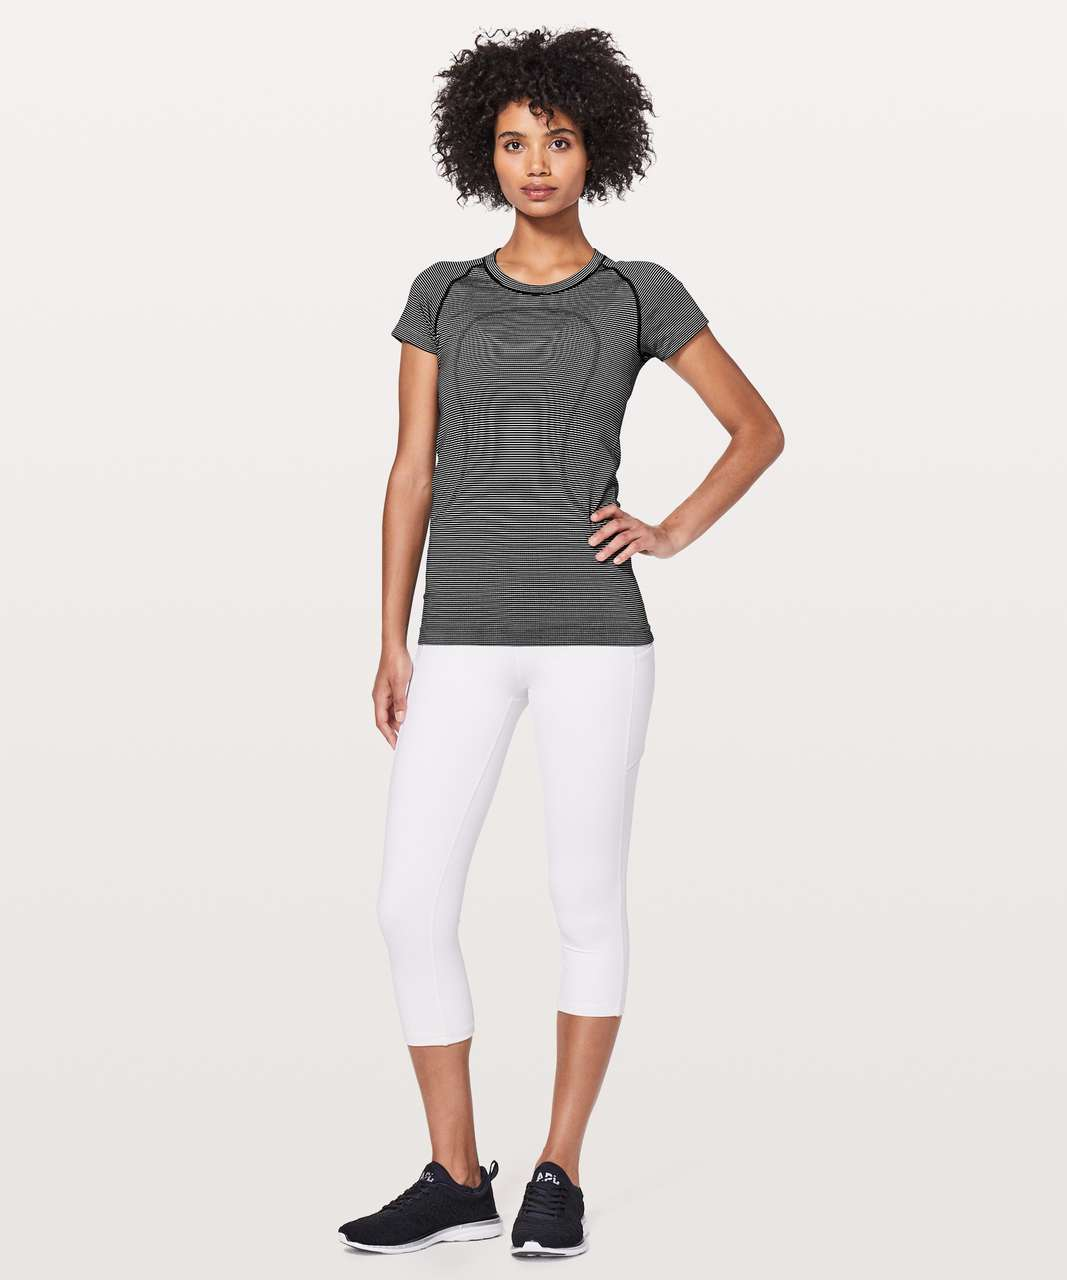 Lululemon Swiftly Tech Short Sleeve Crew - White / White / Black